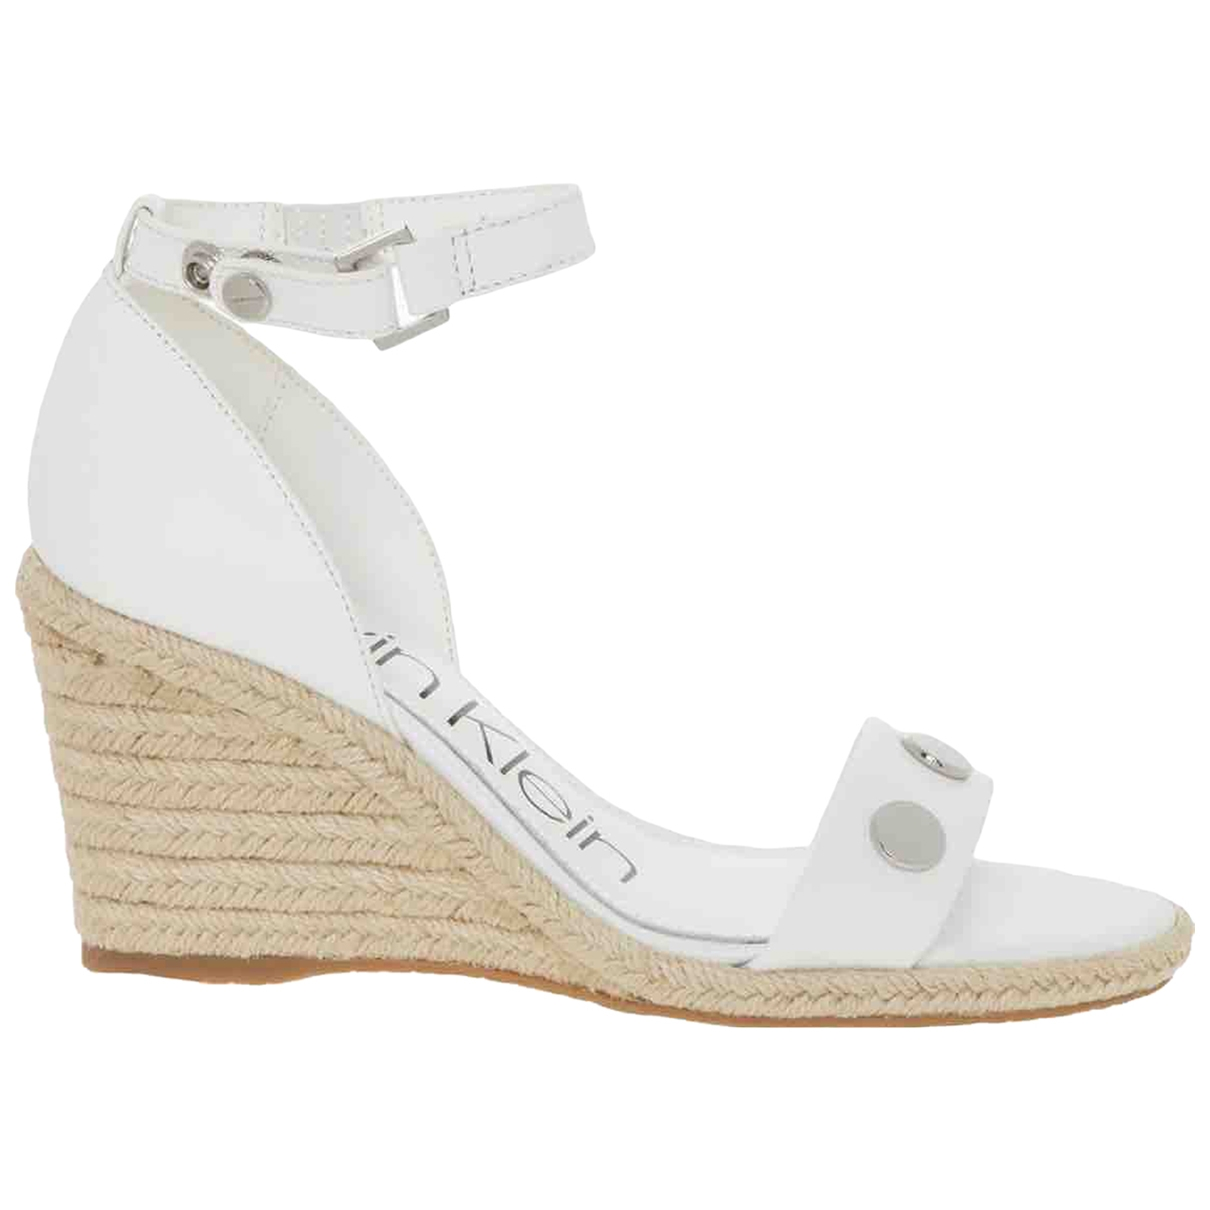 Calvin Klein \N White Leather Sandals for Women 38 EU